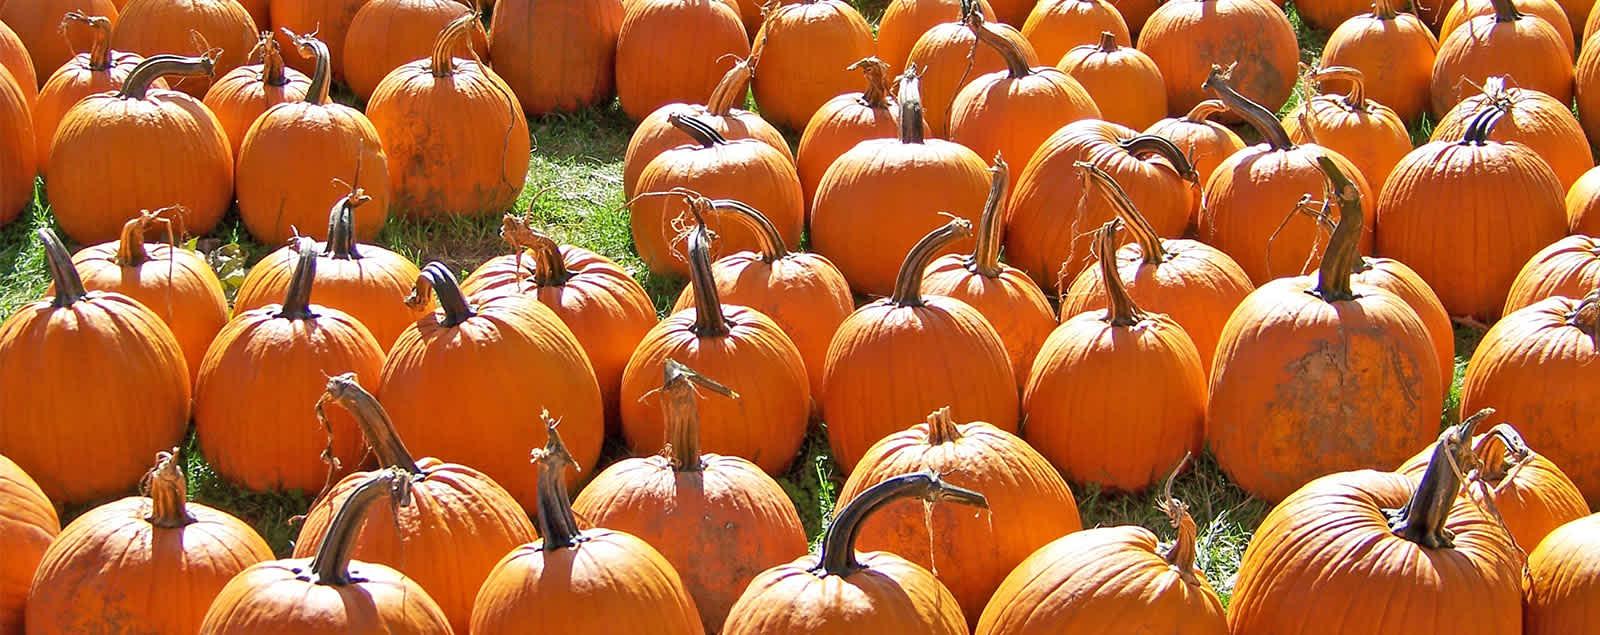 Best Pumpkin Patches For Fall 2020 Fairfax County Va